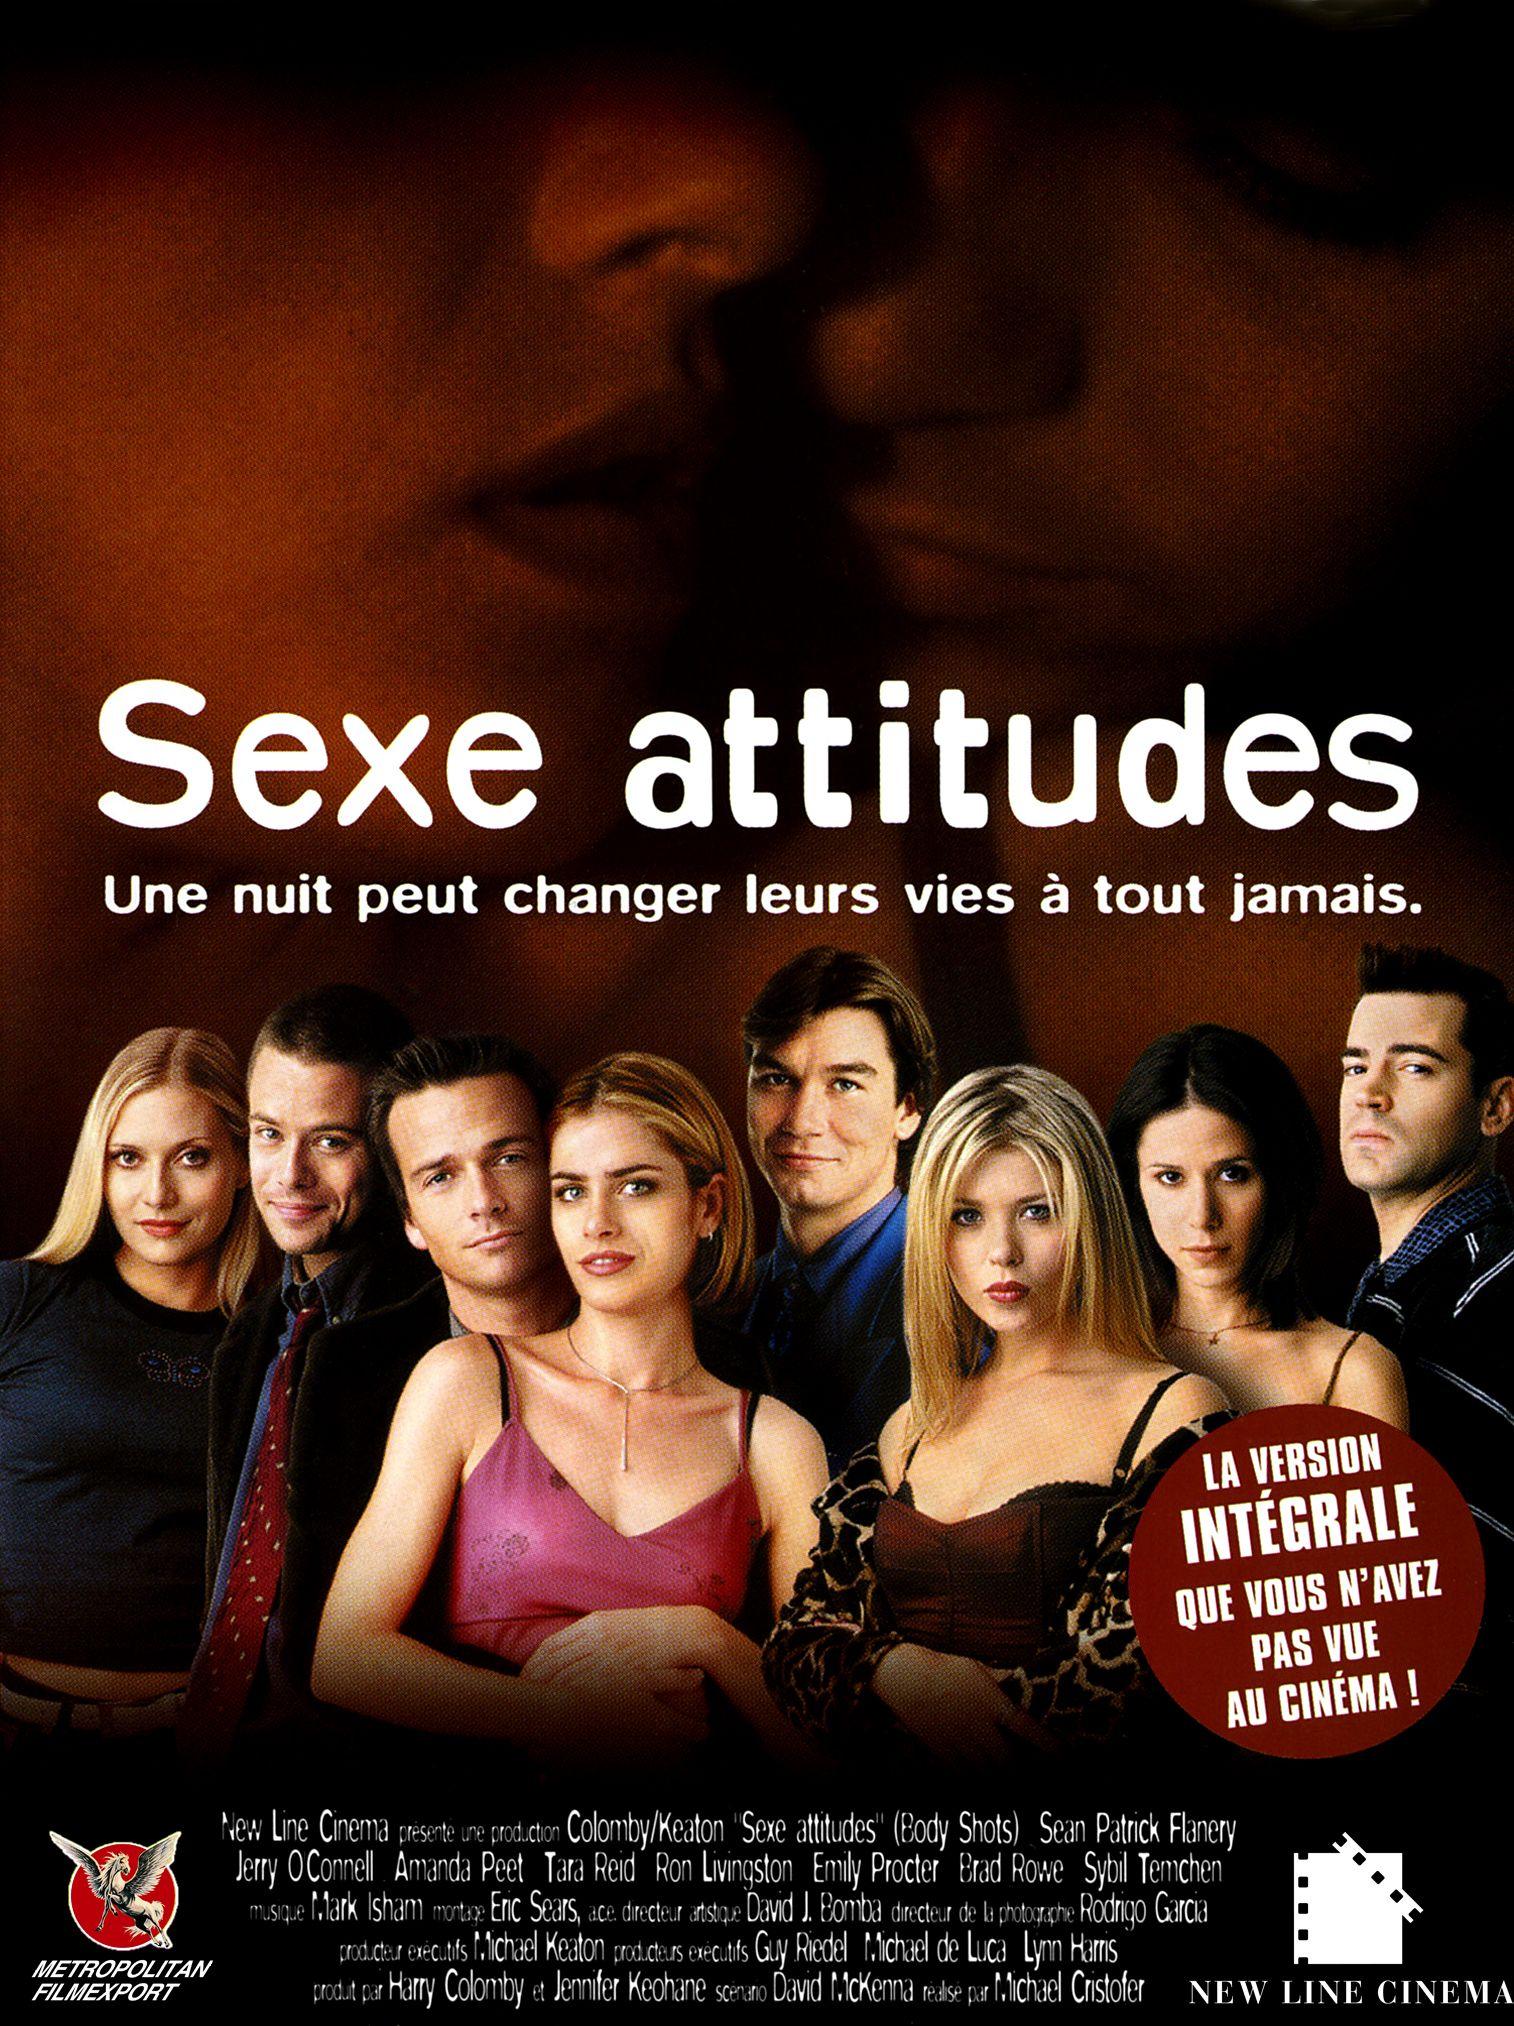 Sxe movies